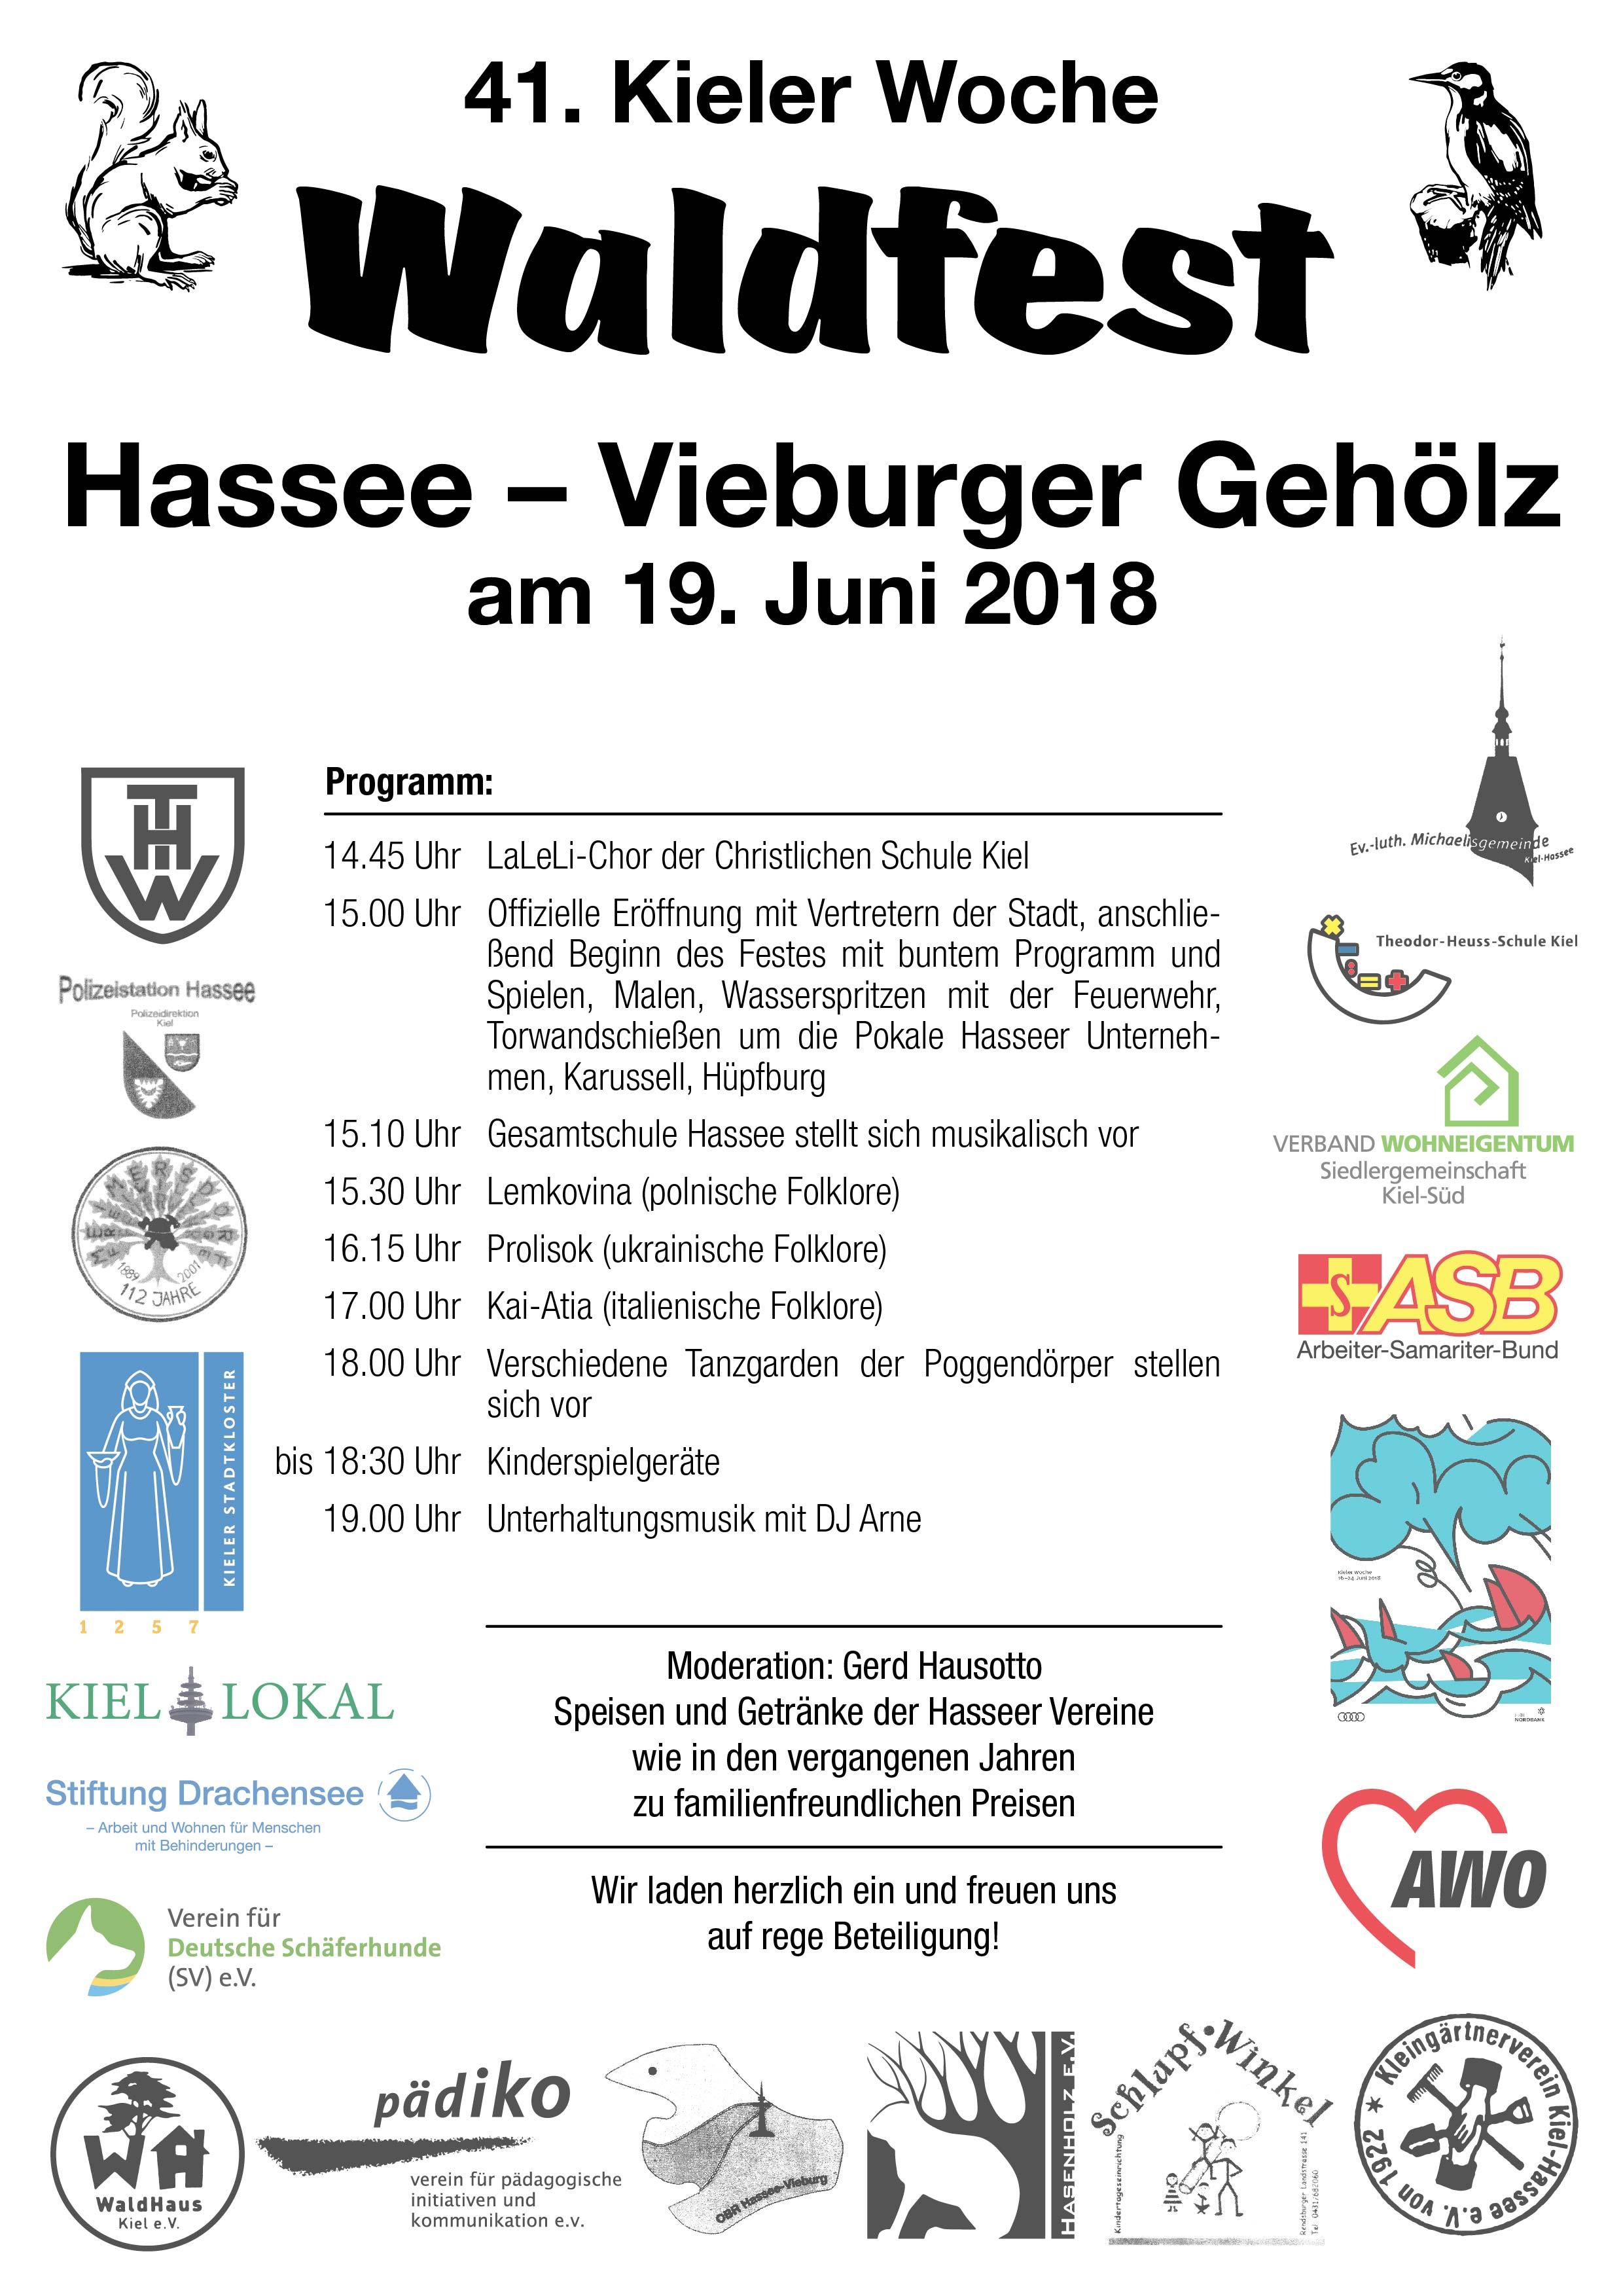 http://www.lebendigeshassee.de/media/image/Waldfest%202018.jpg